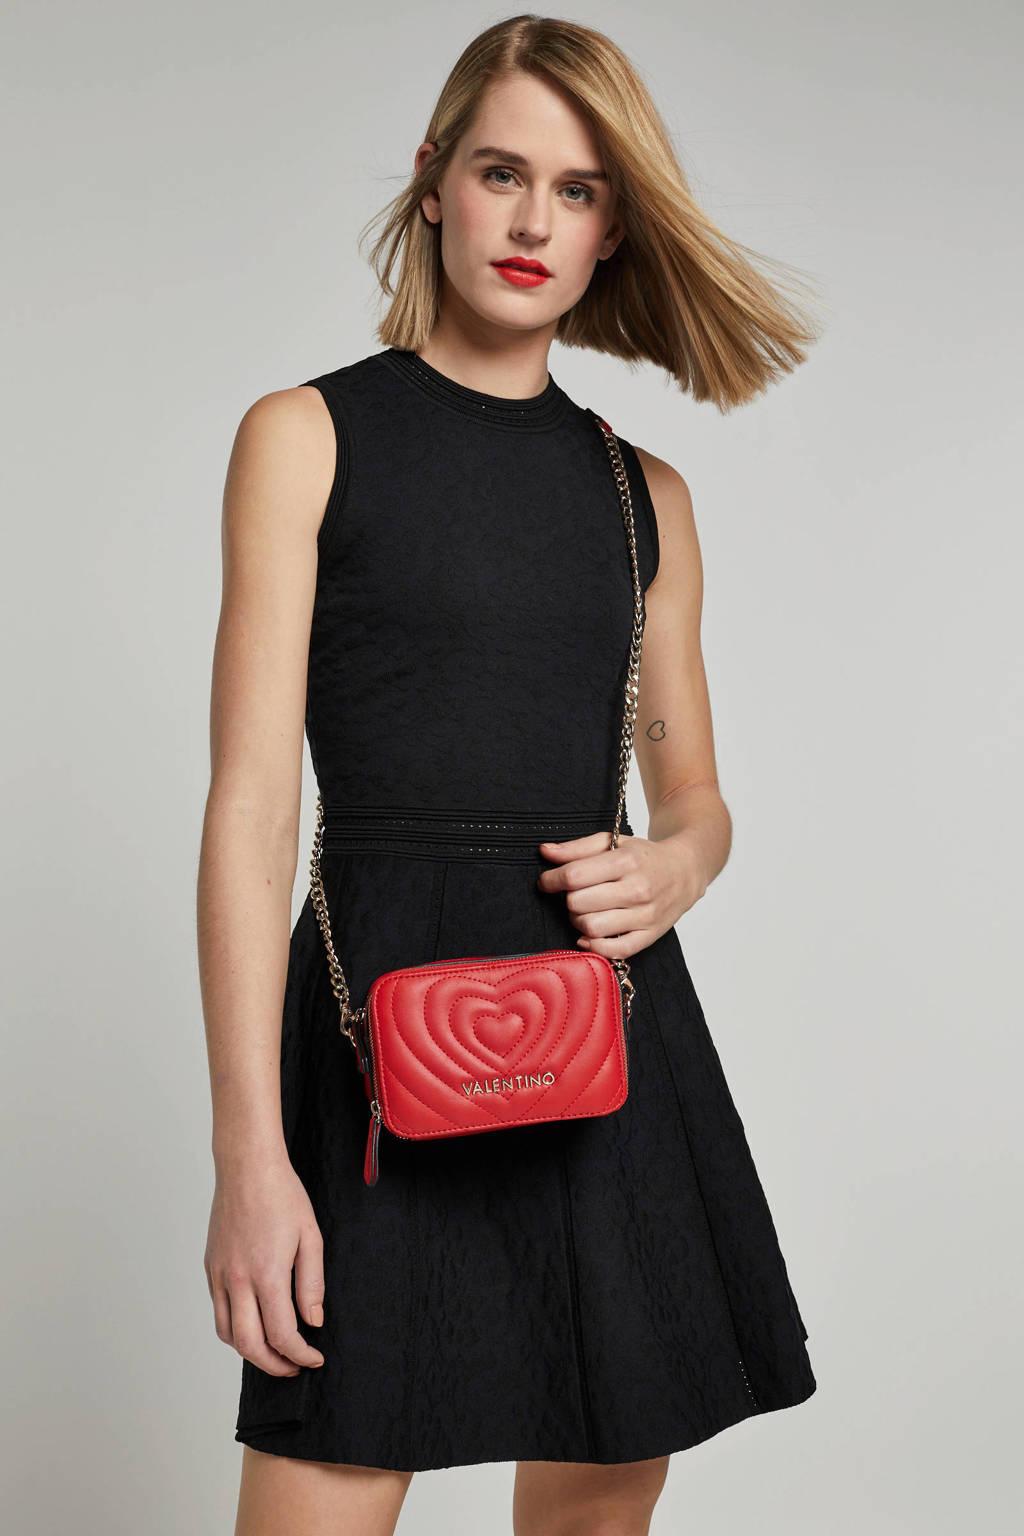 NIKKIE Selected By Kate Moss jurk met all over print, Zwart